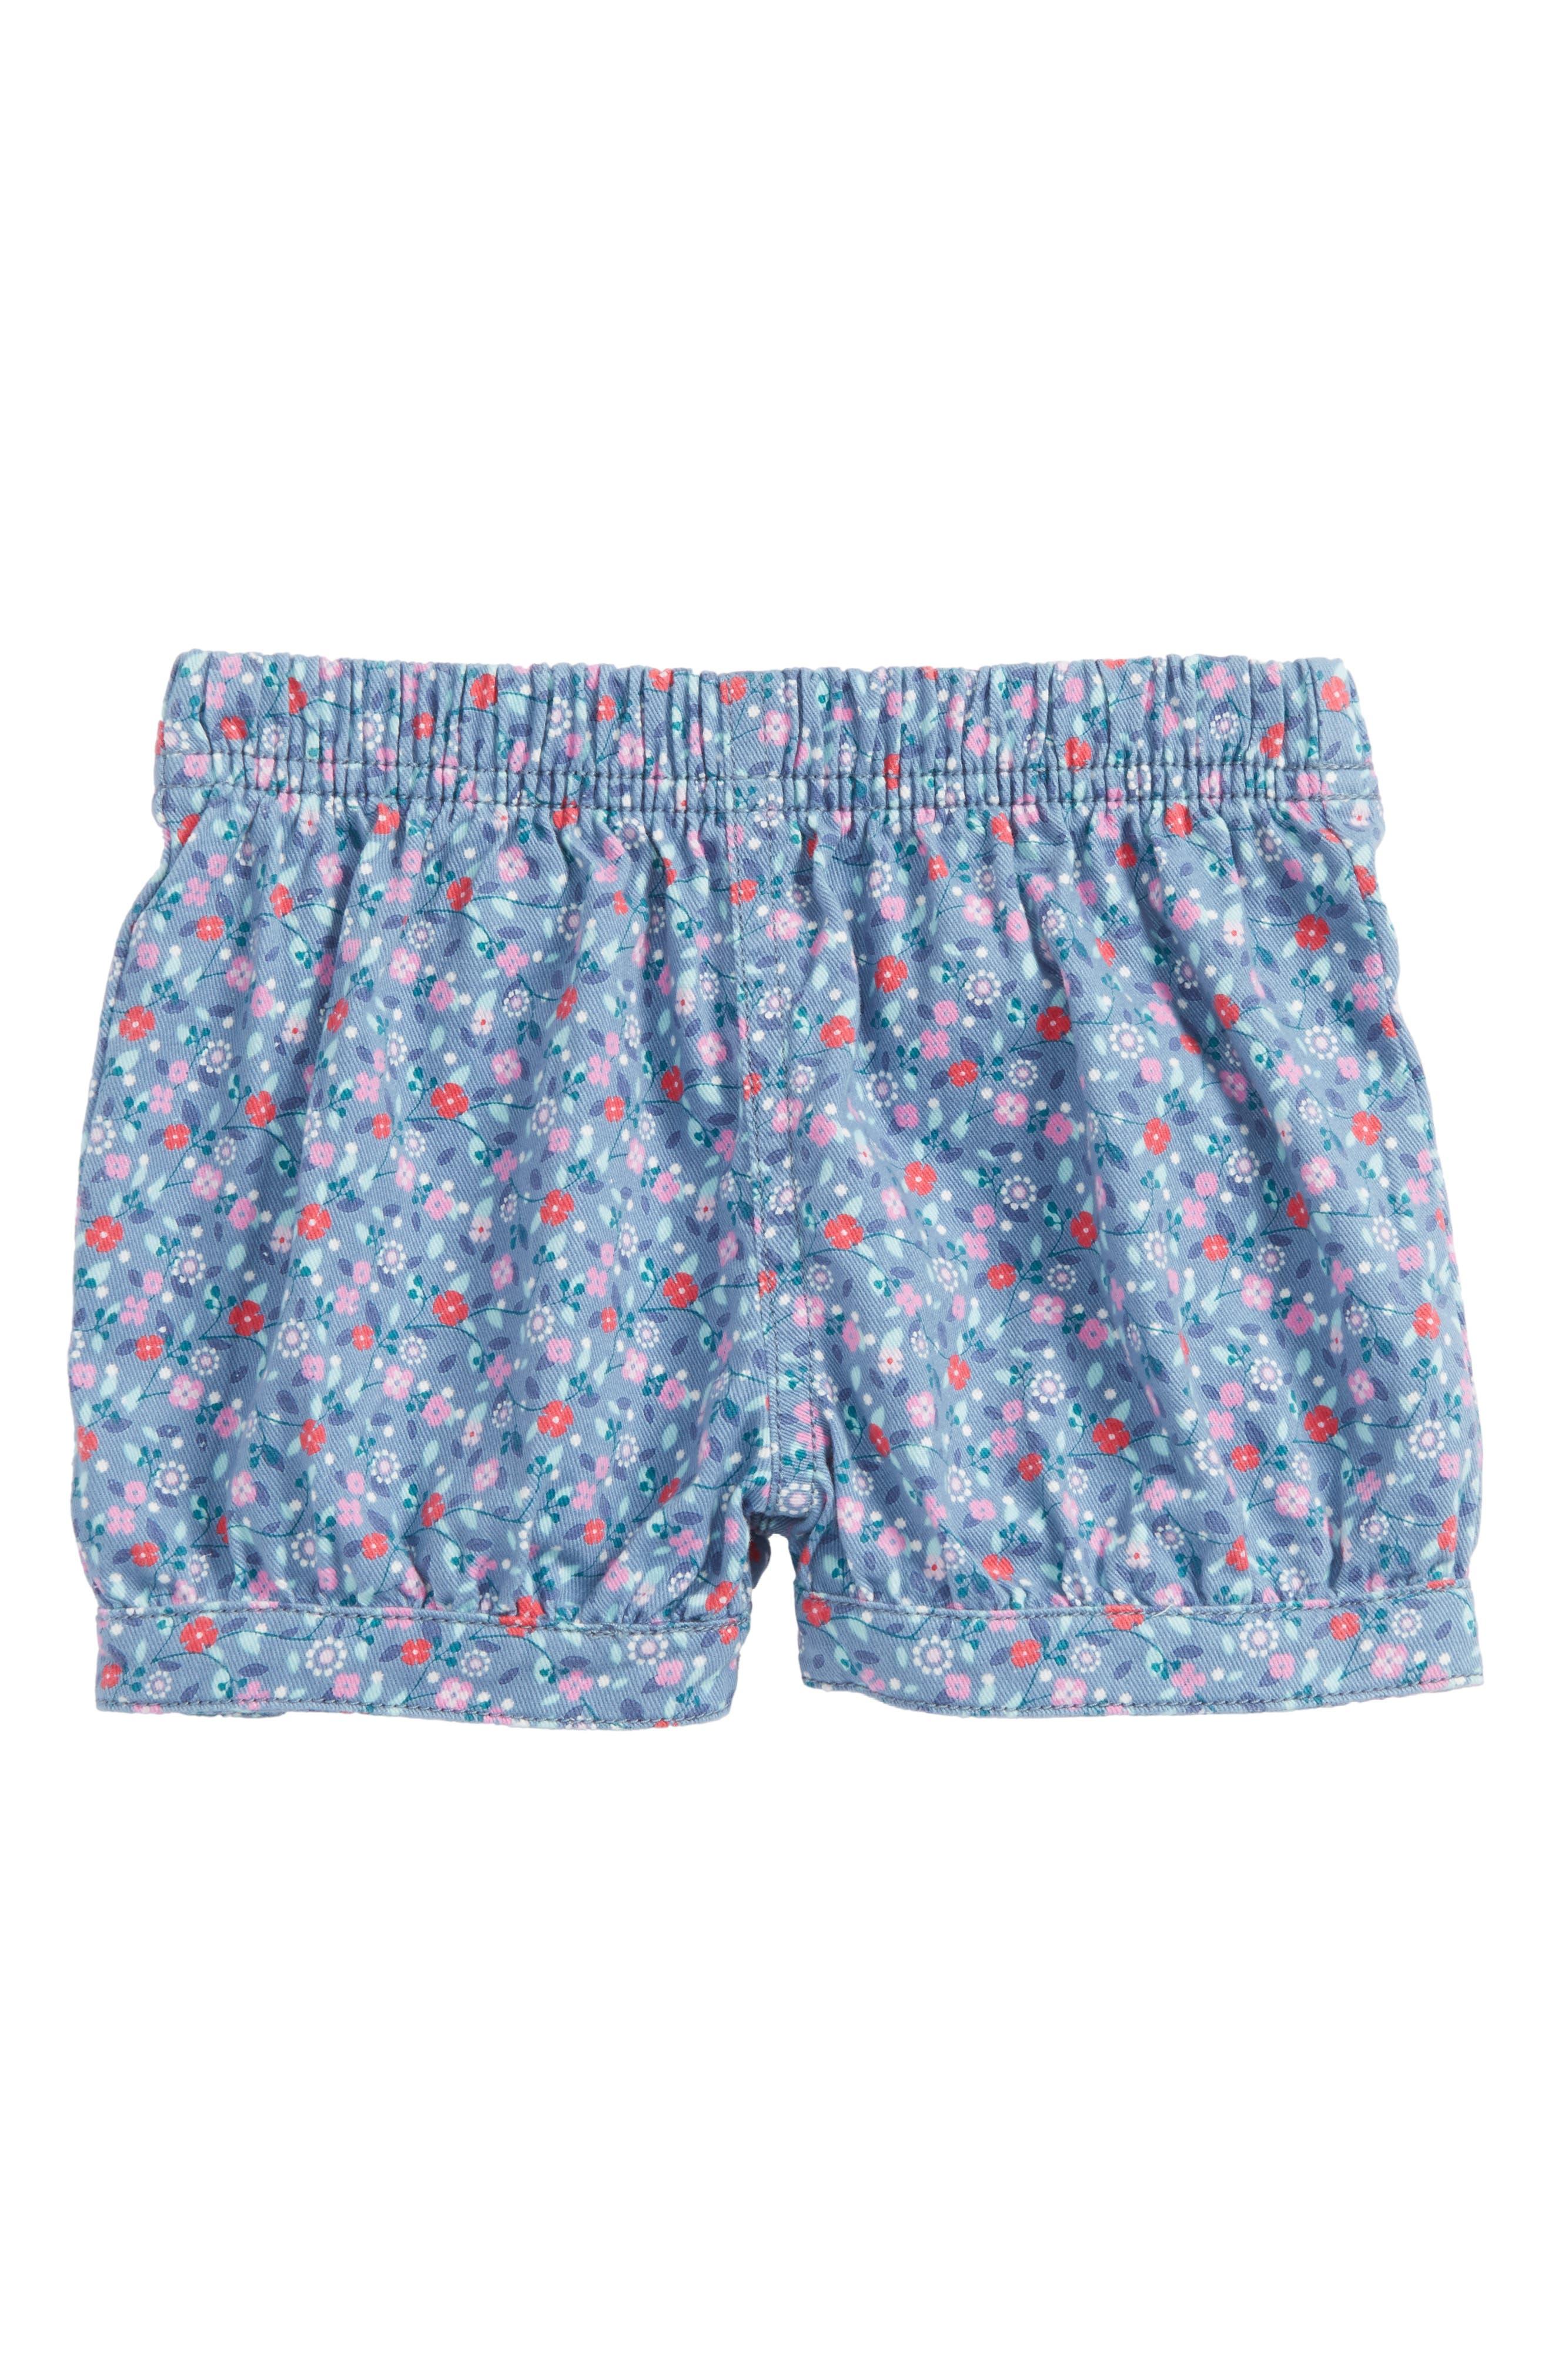 Ditsy Floral Bubble Shorts,                         Main,                         color, Blue Tide Tiny Florals